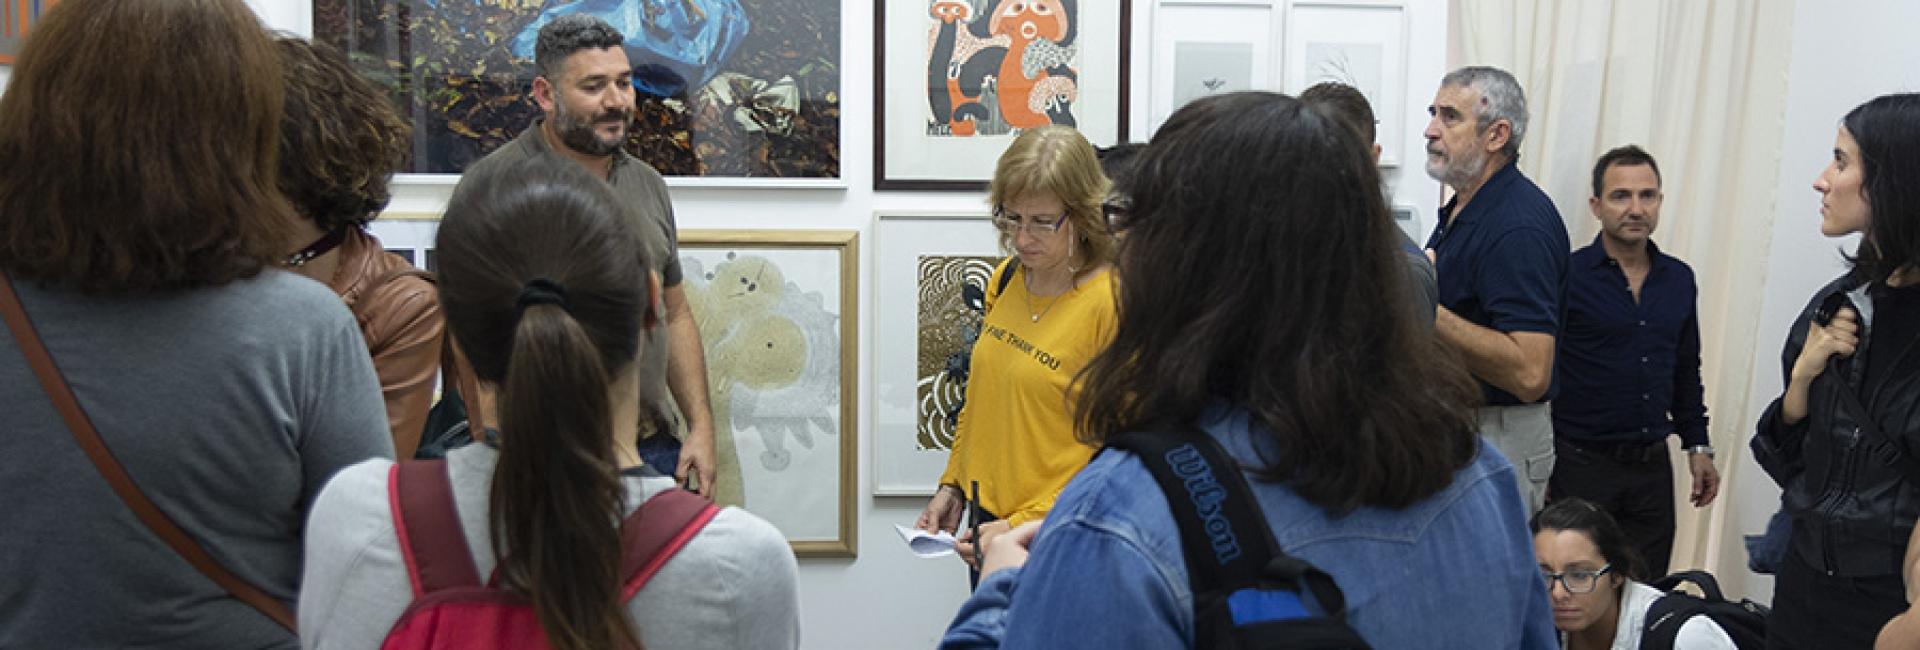 GIRO Circuito de Galerías de Arte |  3º edición  - Galeria Diego Obligado